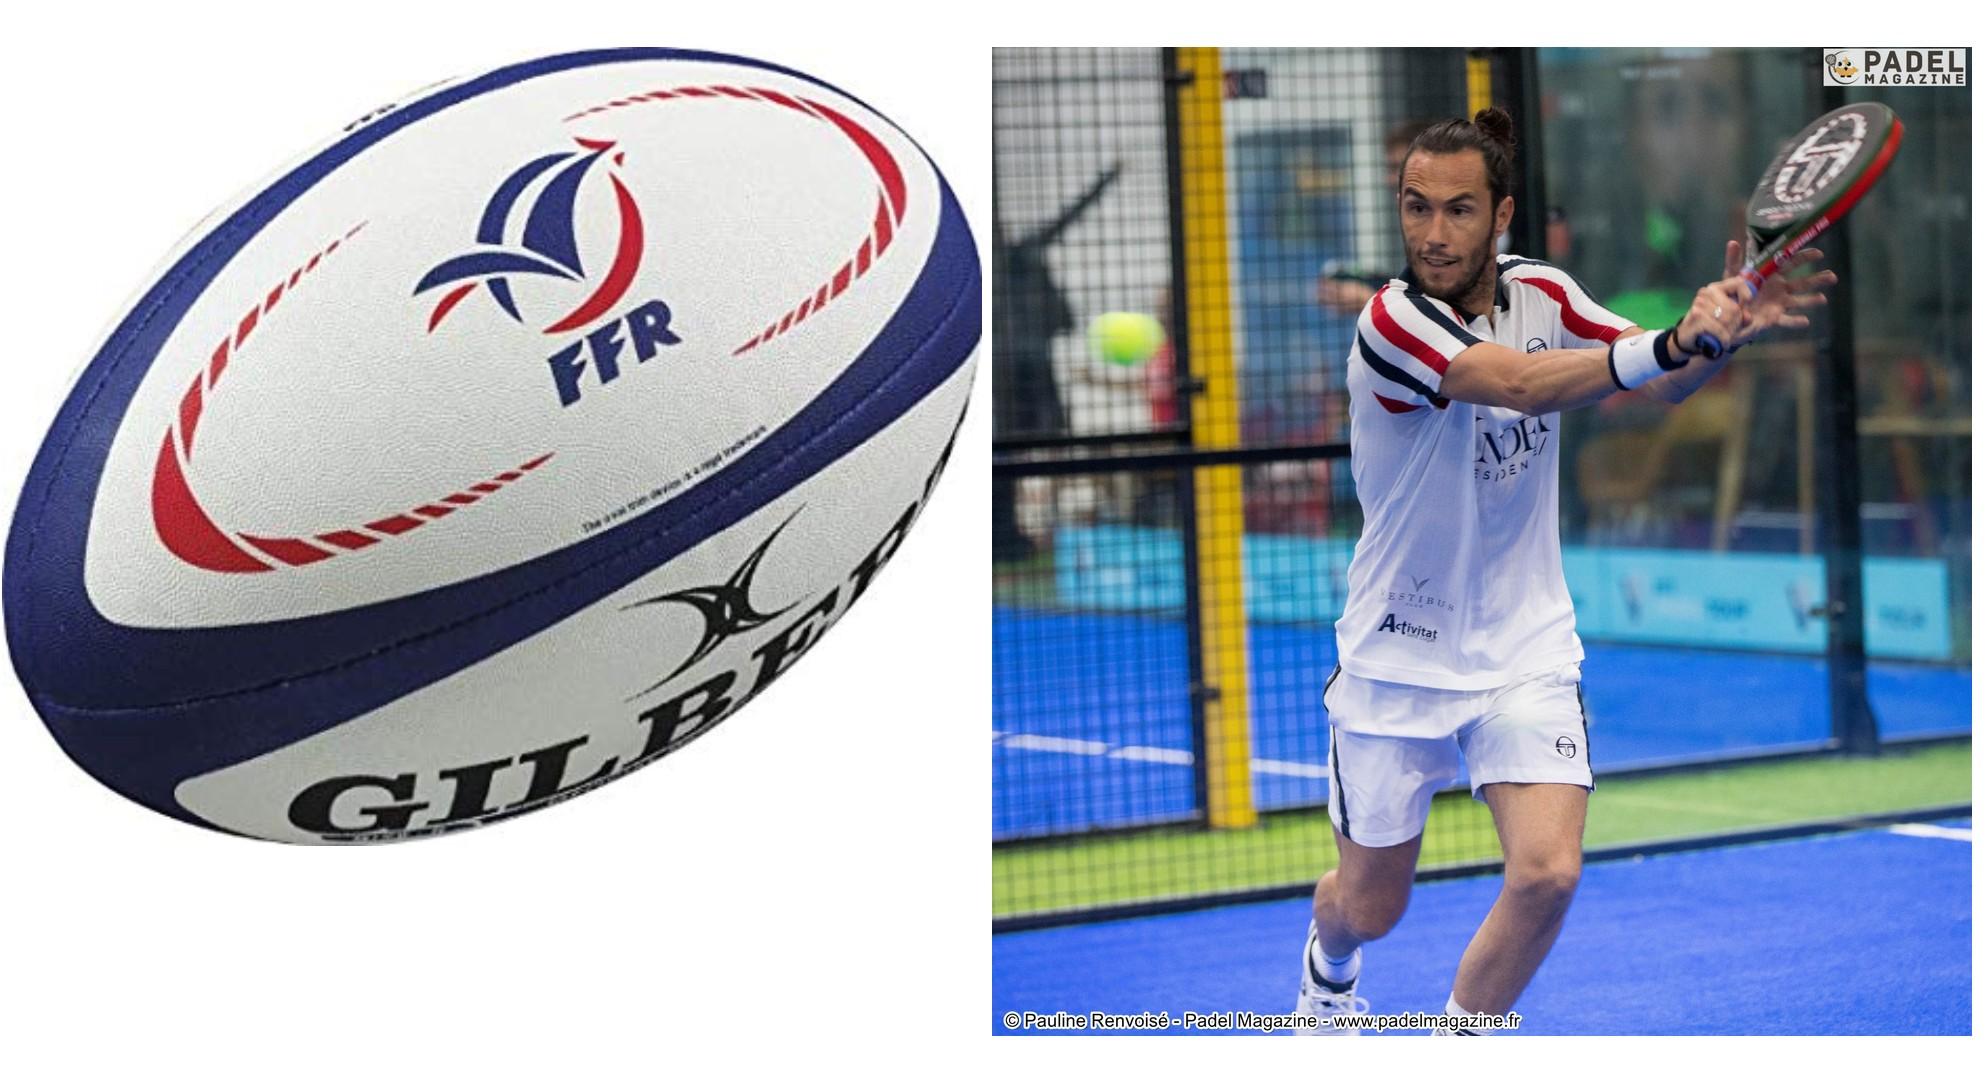 Robin Haziza, future carrière de rugbyman ?